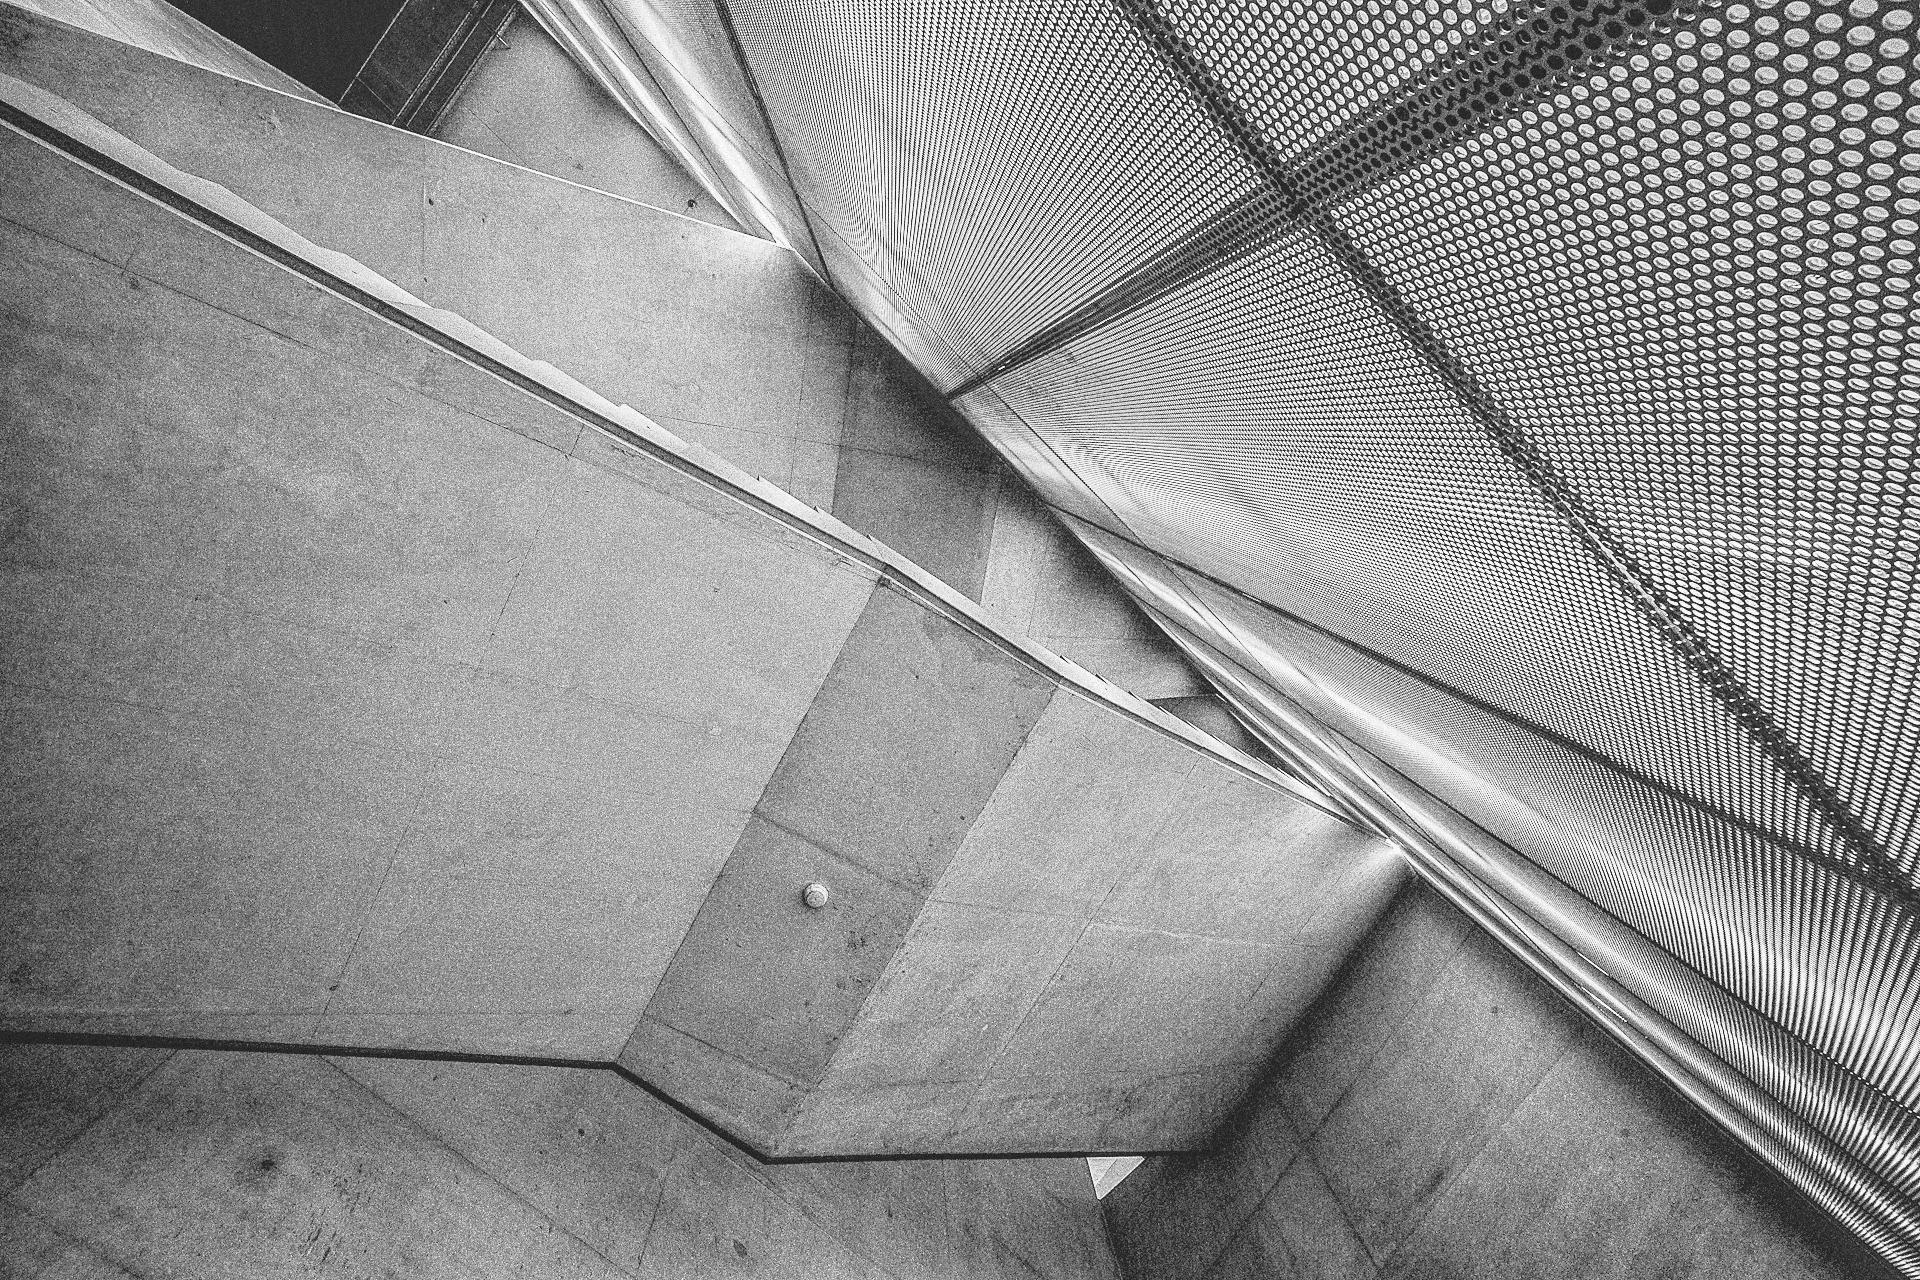 10-Aniversario-Casa-da-Musica-Porto-Reportagem-Fotografica-Photographic-Coverage-Fotografia-Photography-Arquitectura-Architecture-Rem-Koolhaas-bonjourmolotov-25N.jpg